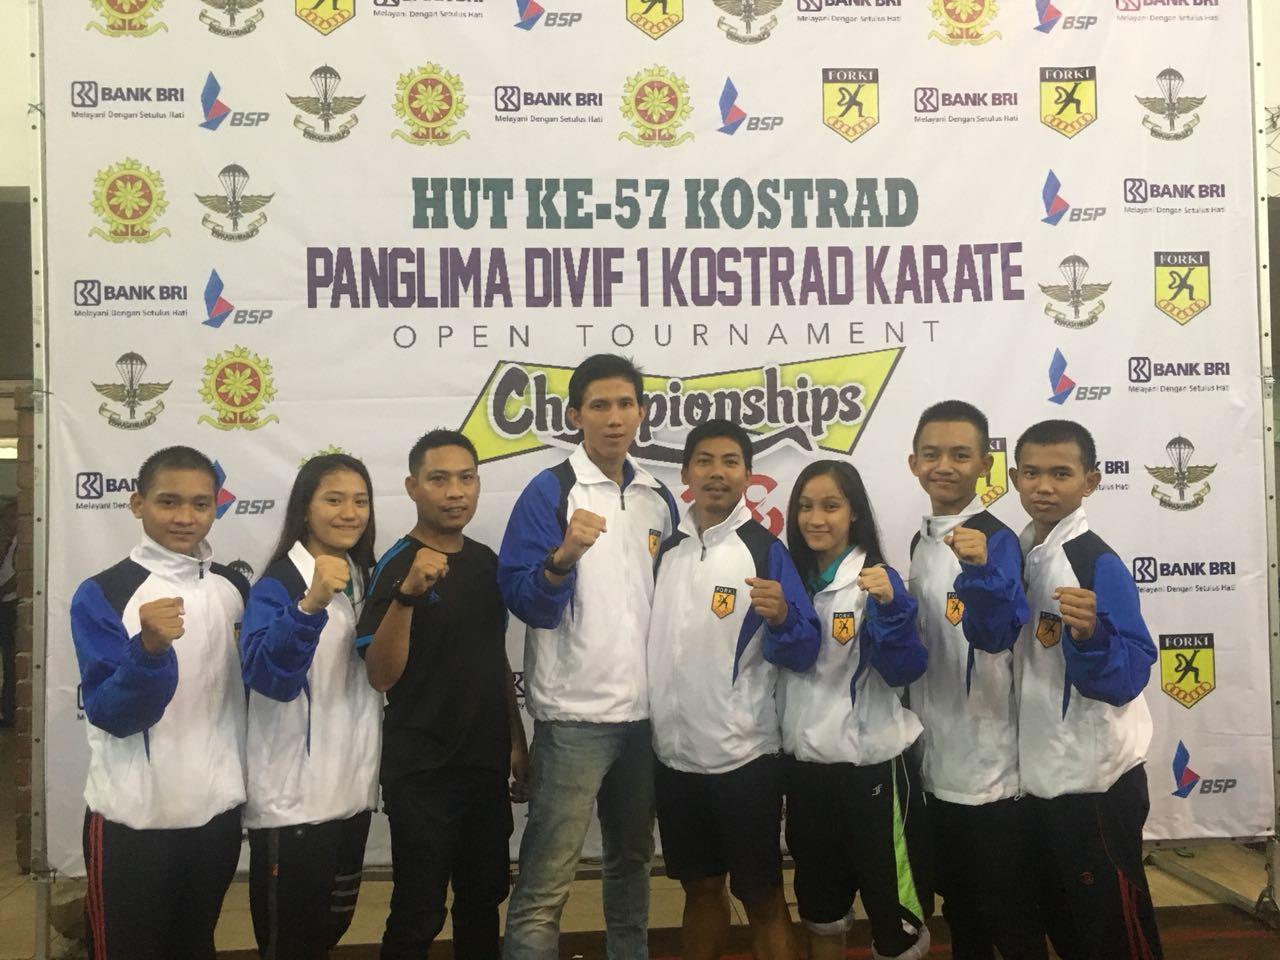 Atlet PPLP Raih 3 Medali di Open Tournamen Karate Championships